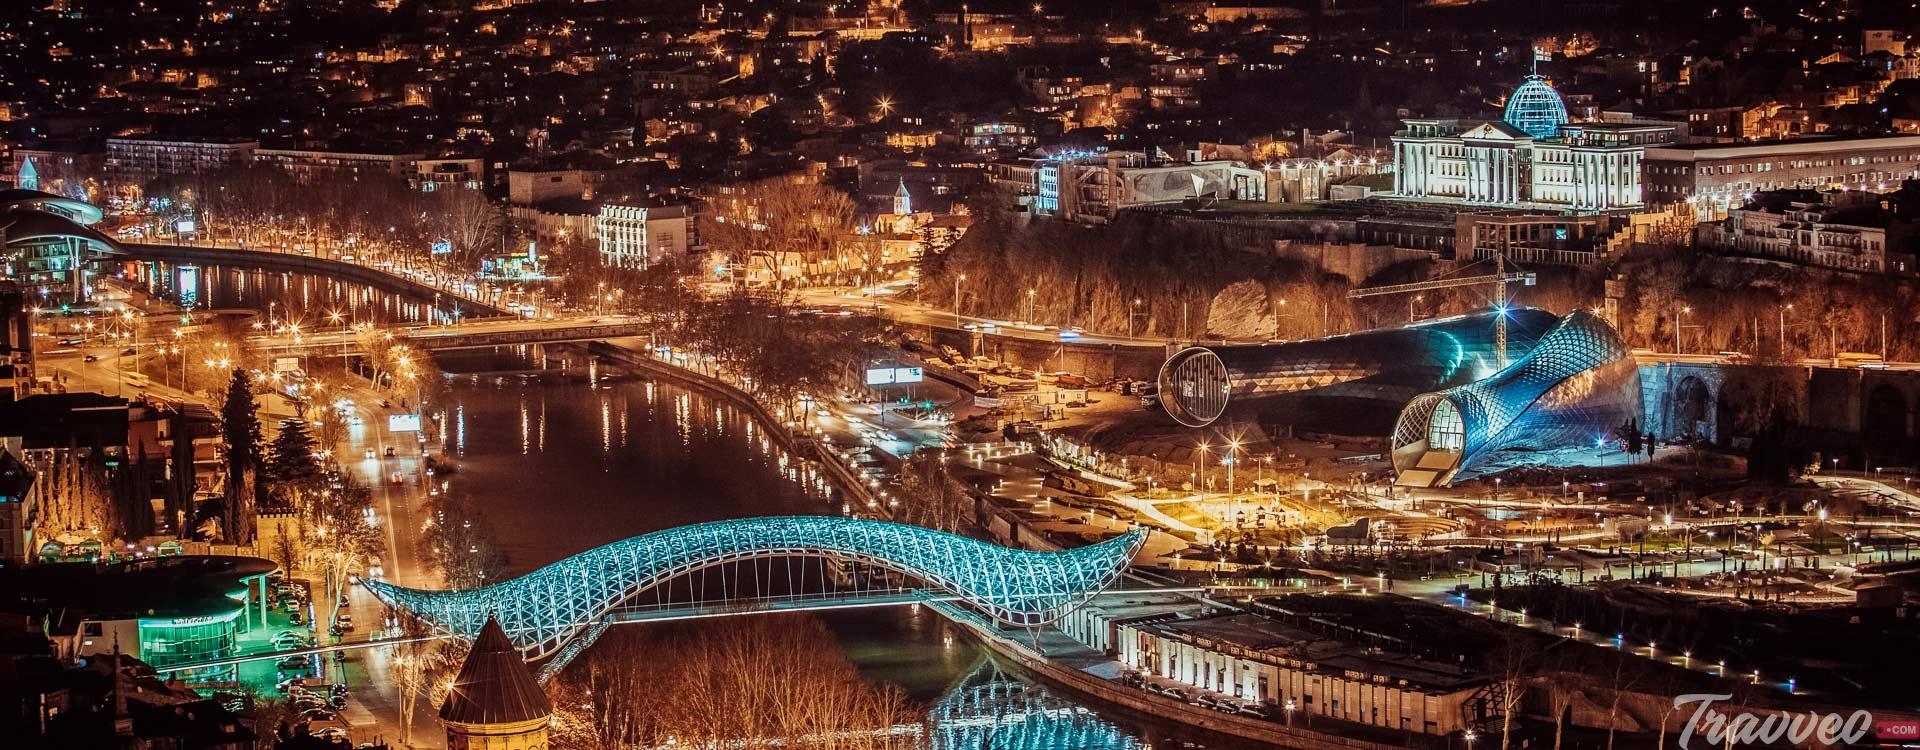 جسر السلام